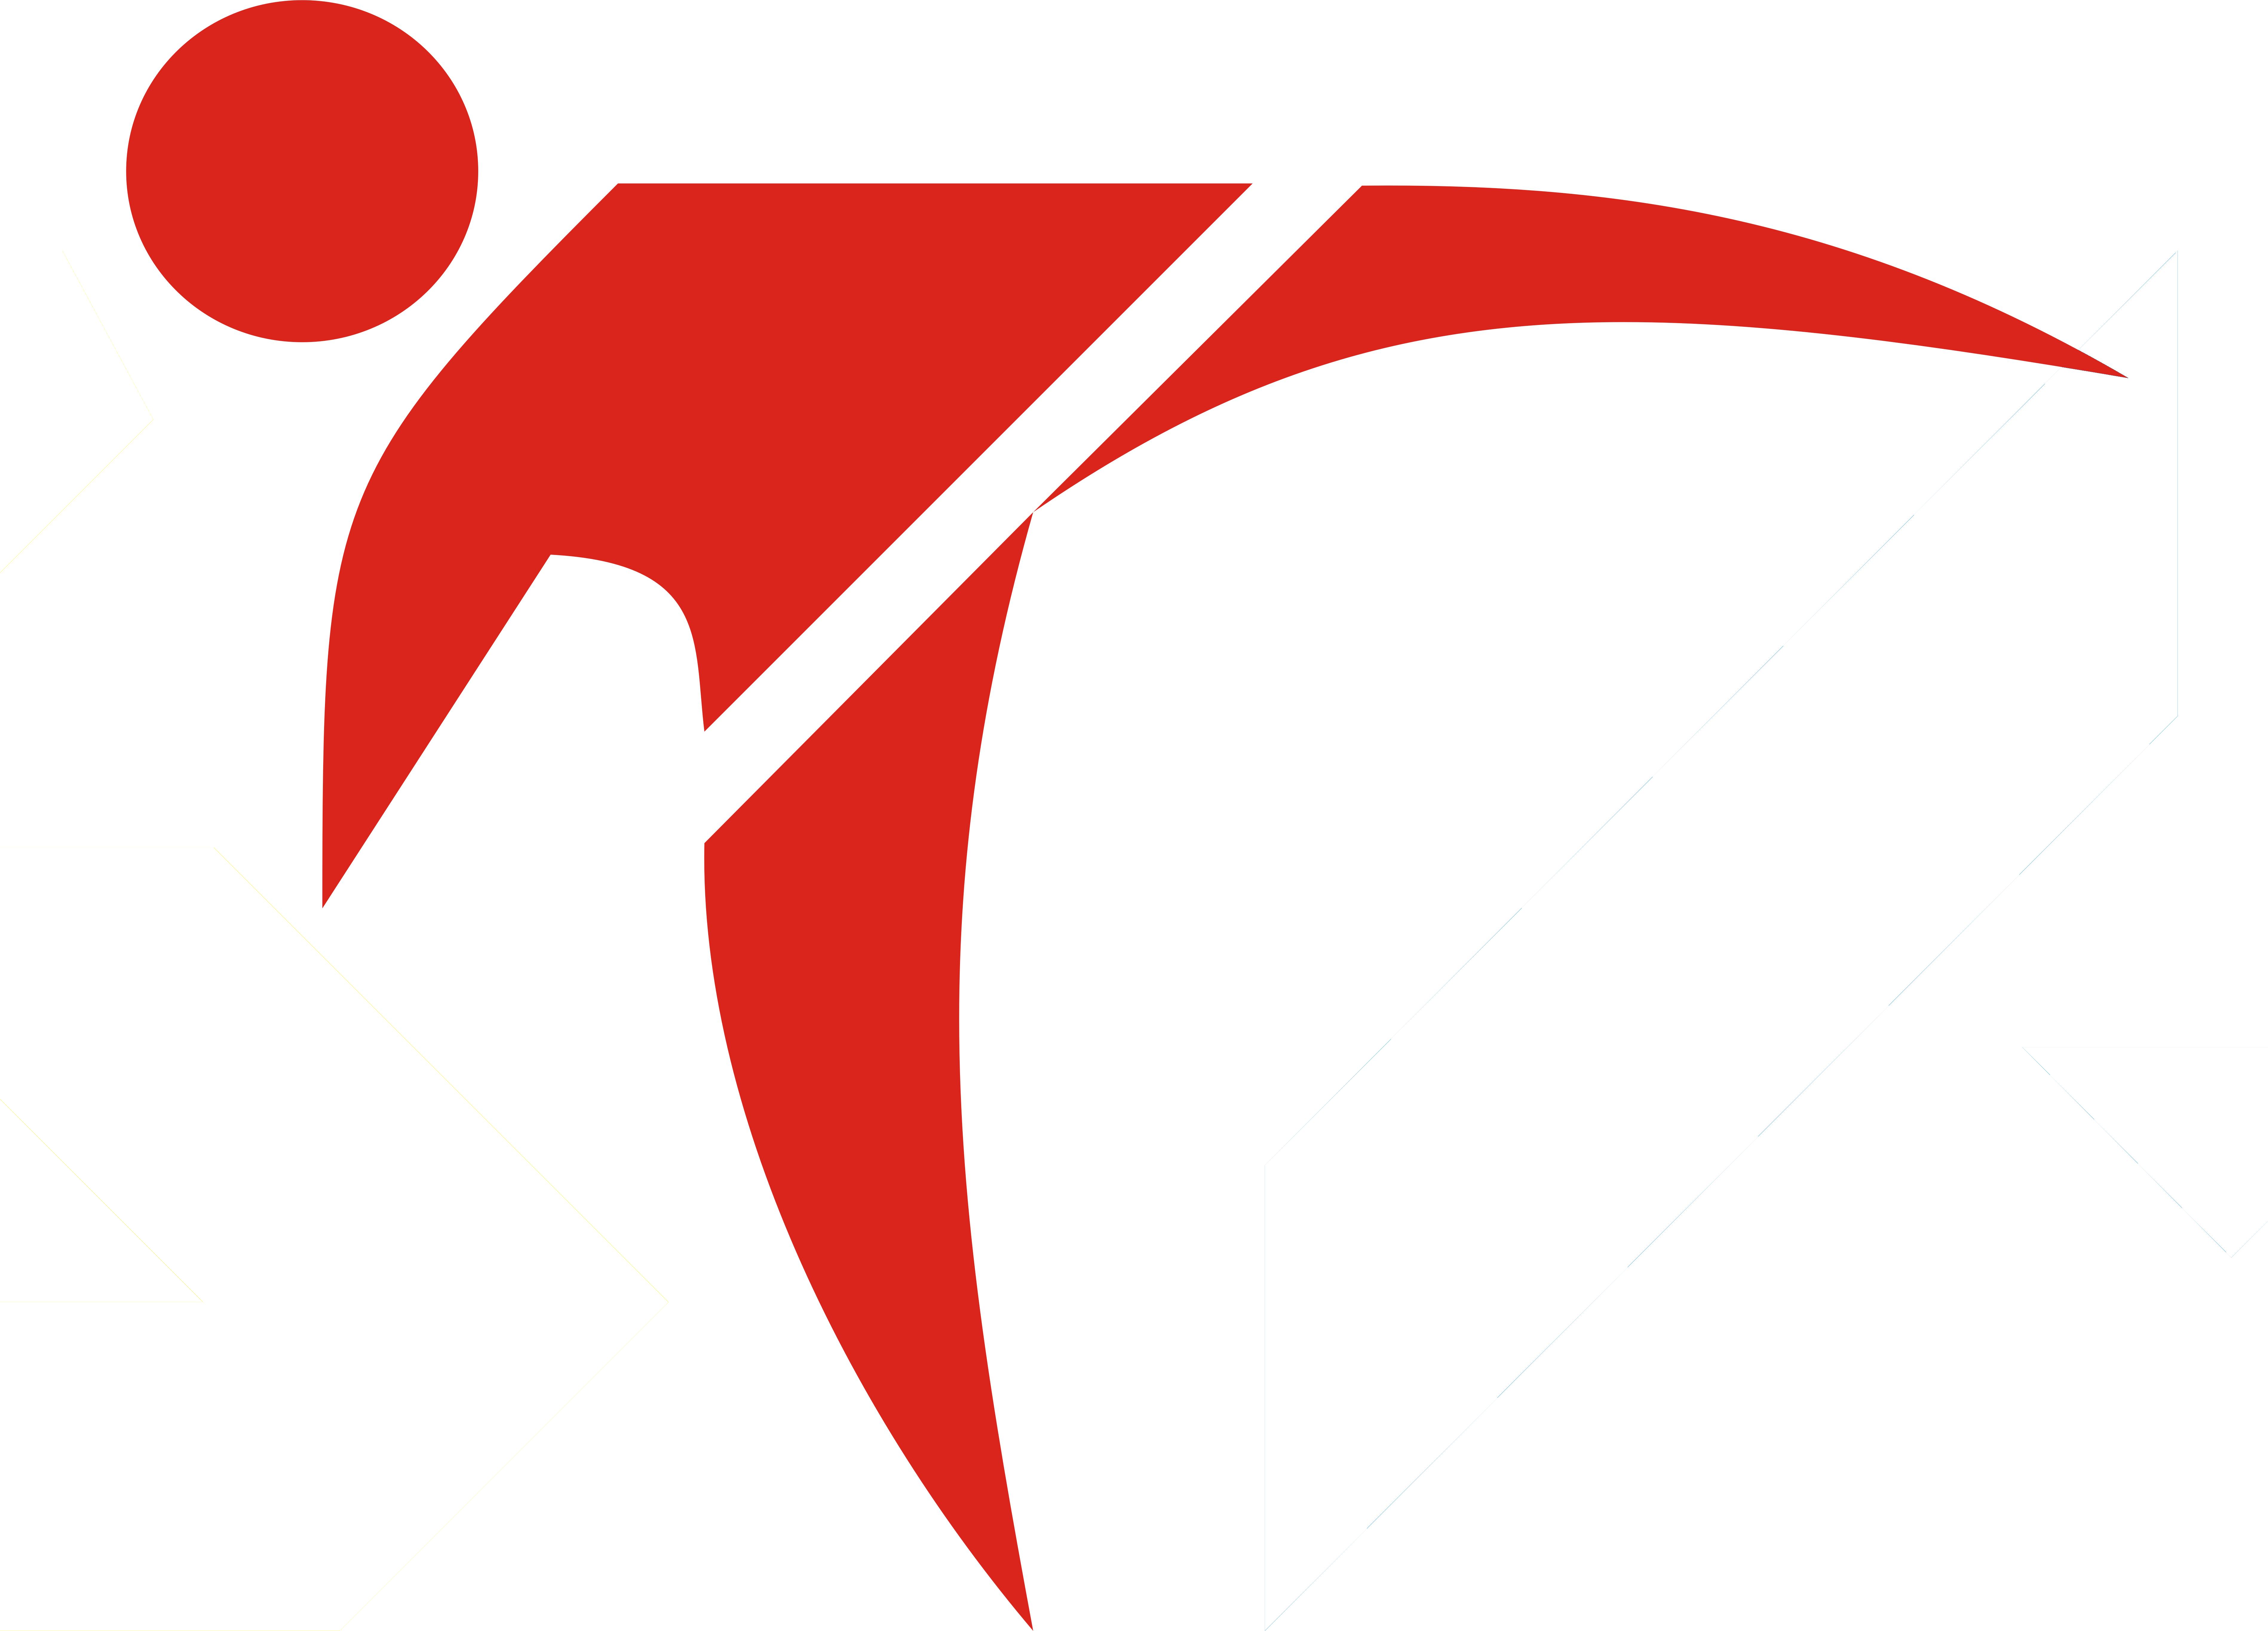 Tae Kwon Do Best Kick Logo Cool Logo Taekwondo Fun Things To Do